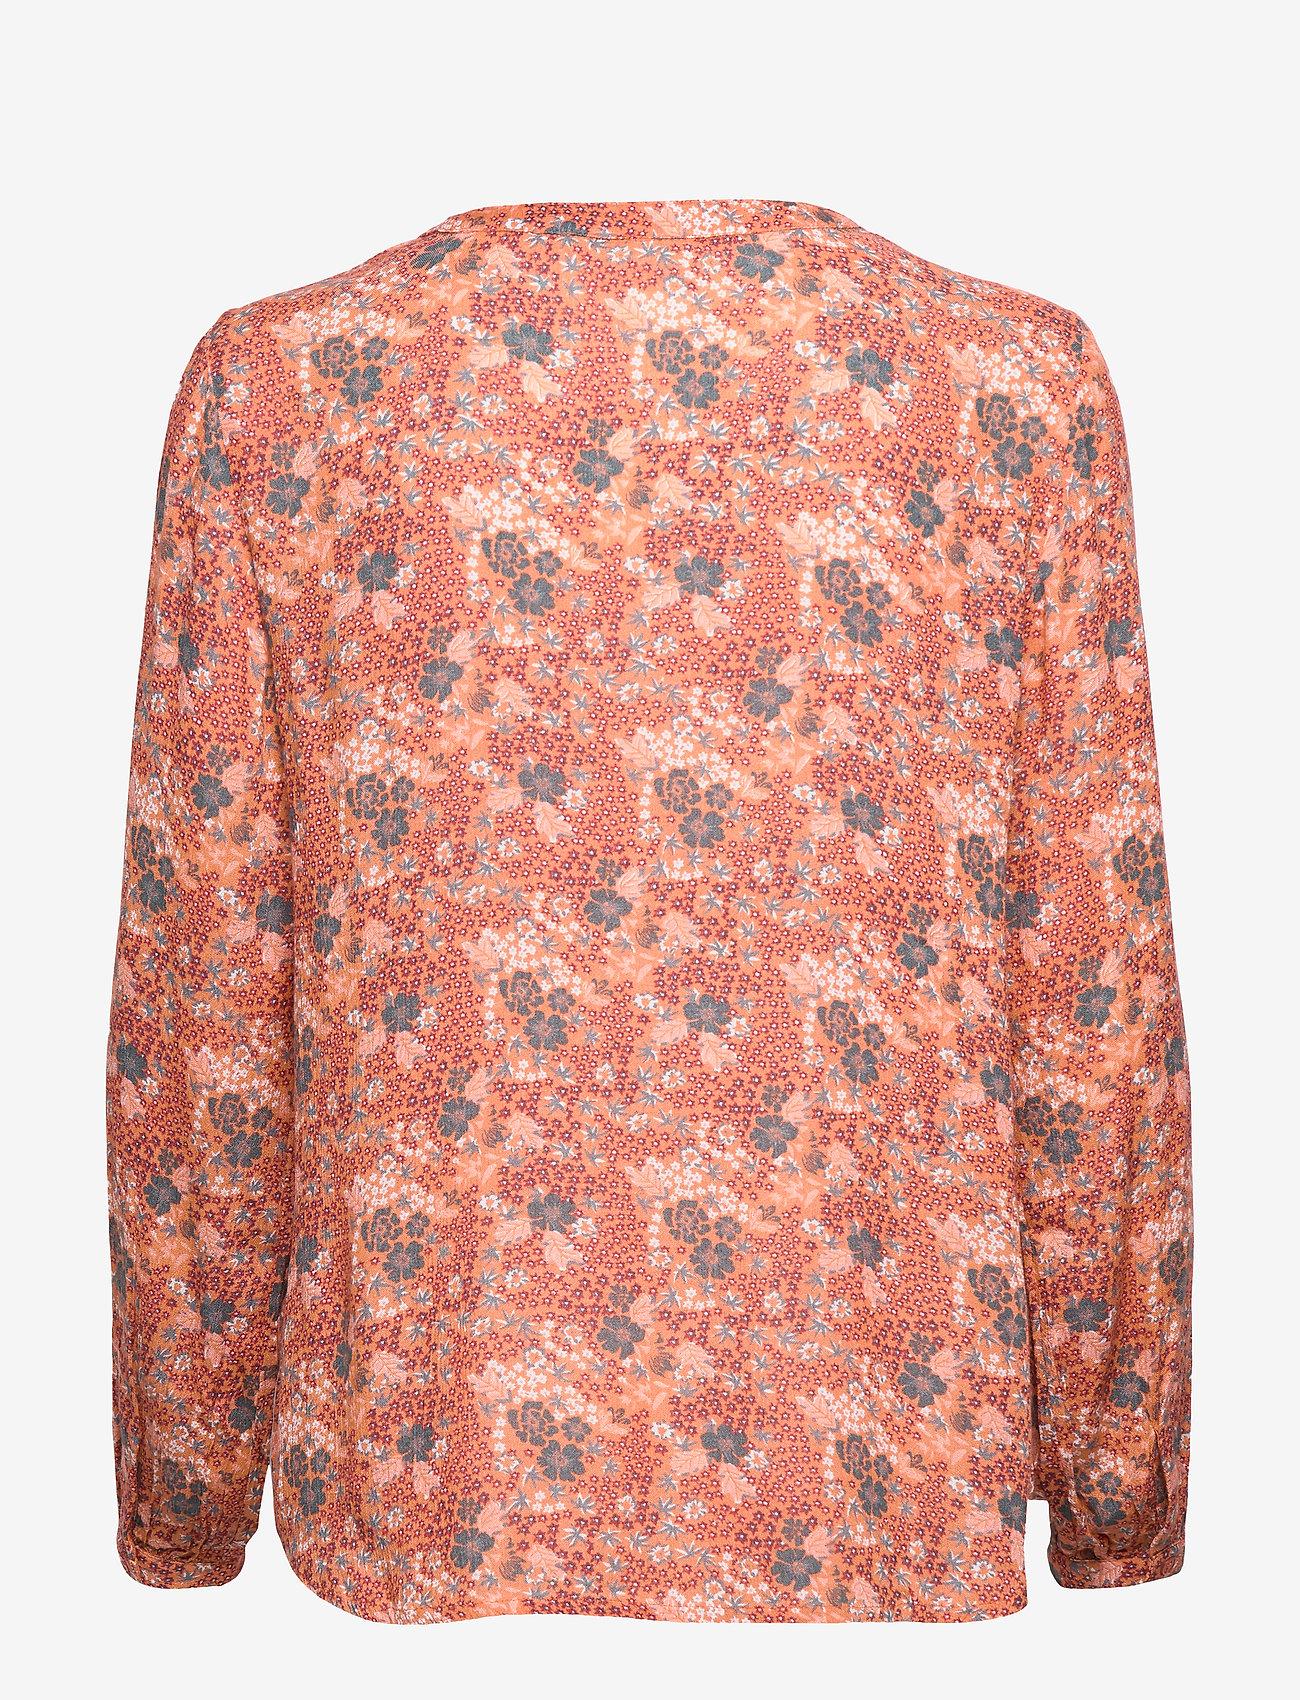 Kaffe KAsana Amber Blouse Min 16 pcs - Bluzki & Koszule DULL ORANGE - Kobiety Odzież.